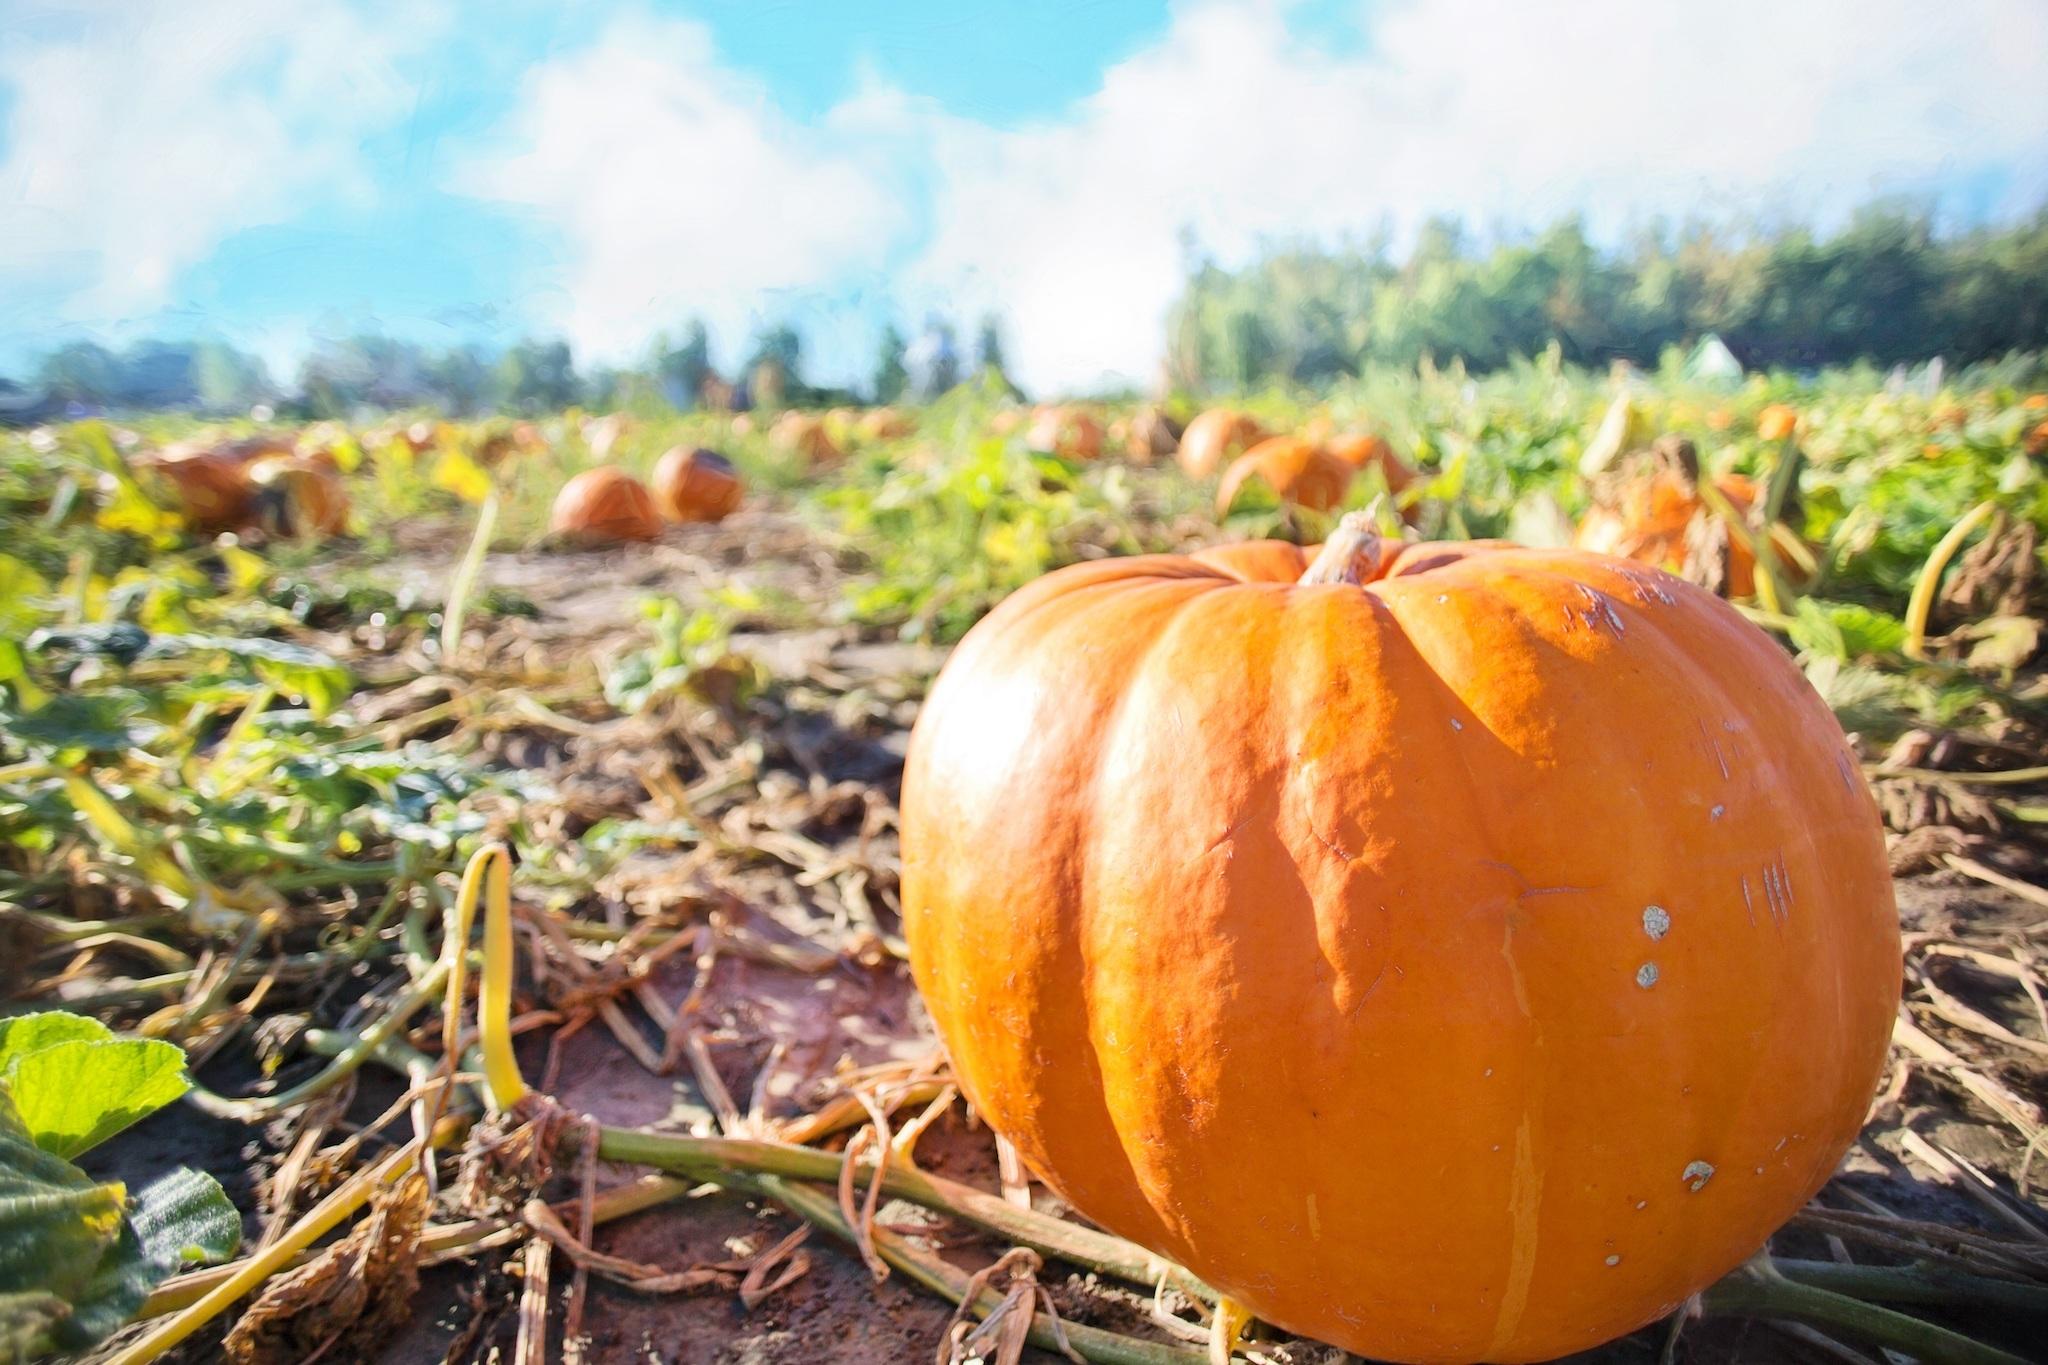 8 best pumpkin patches near philadelphia